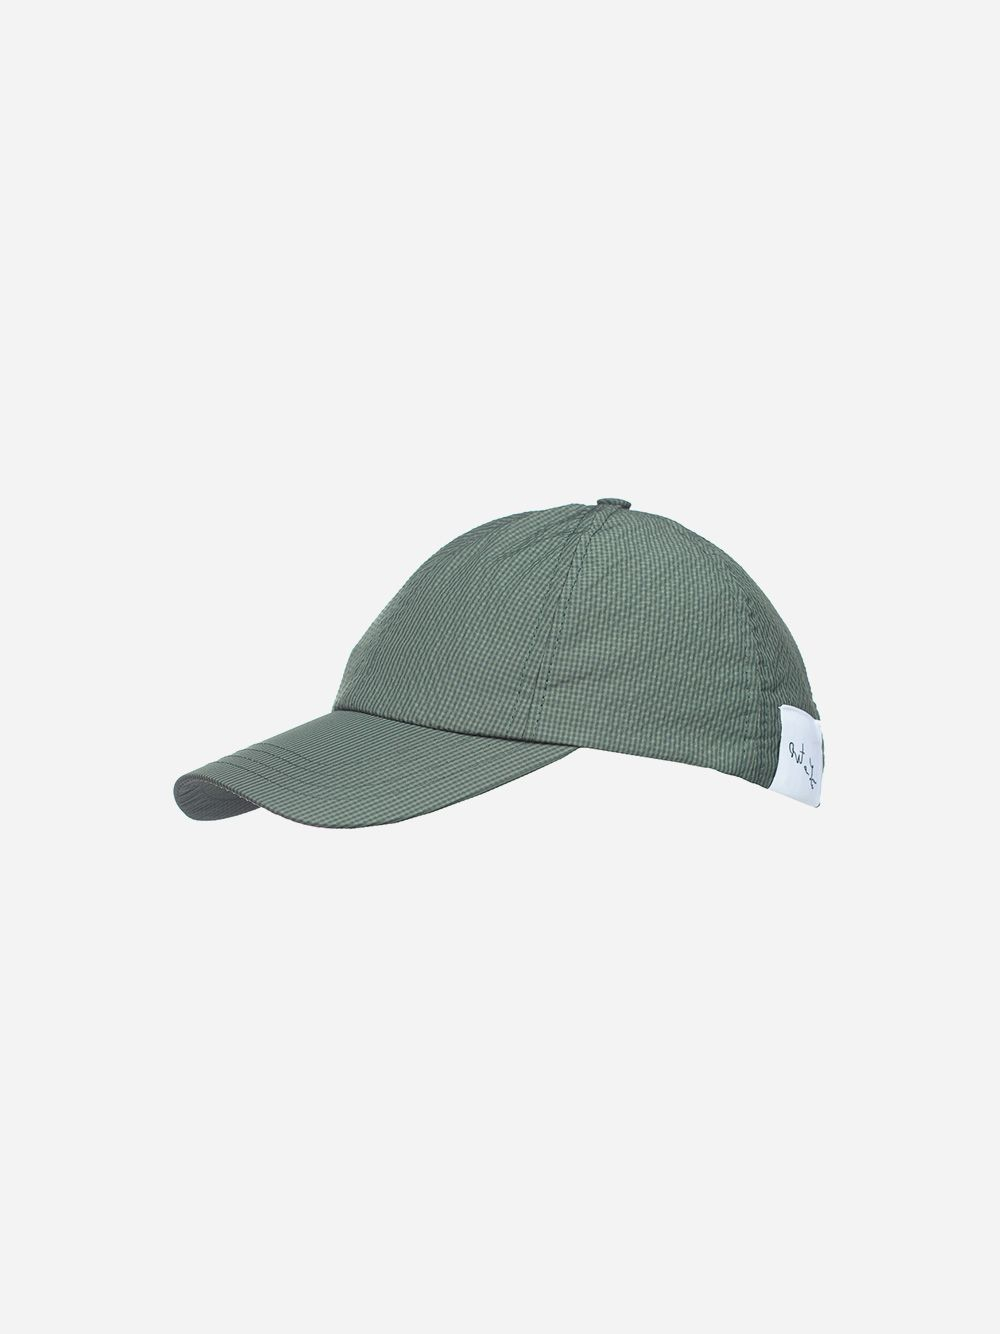 Camo Green Cap and Backpack Set   Rita Sá